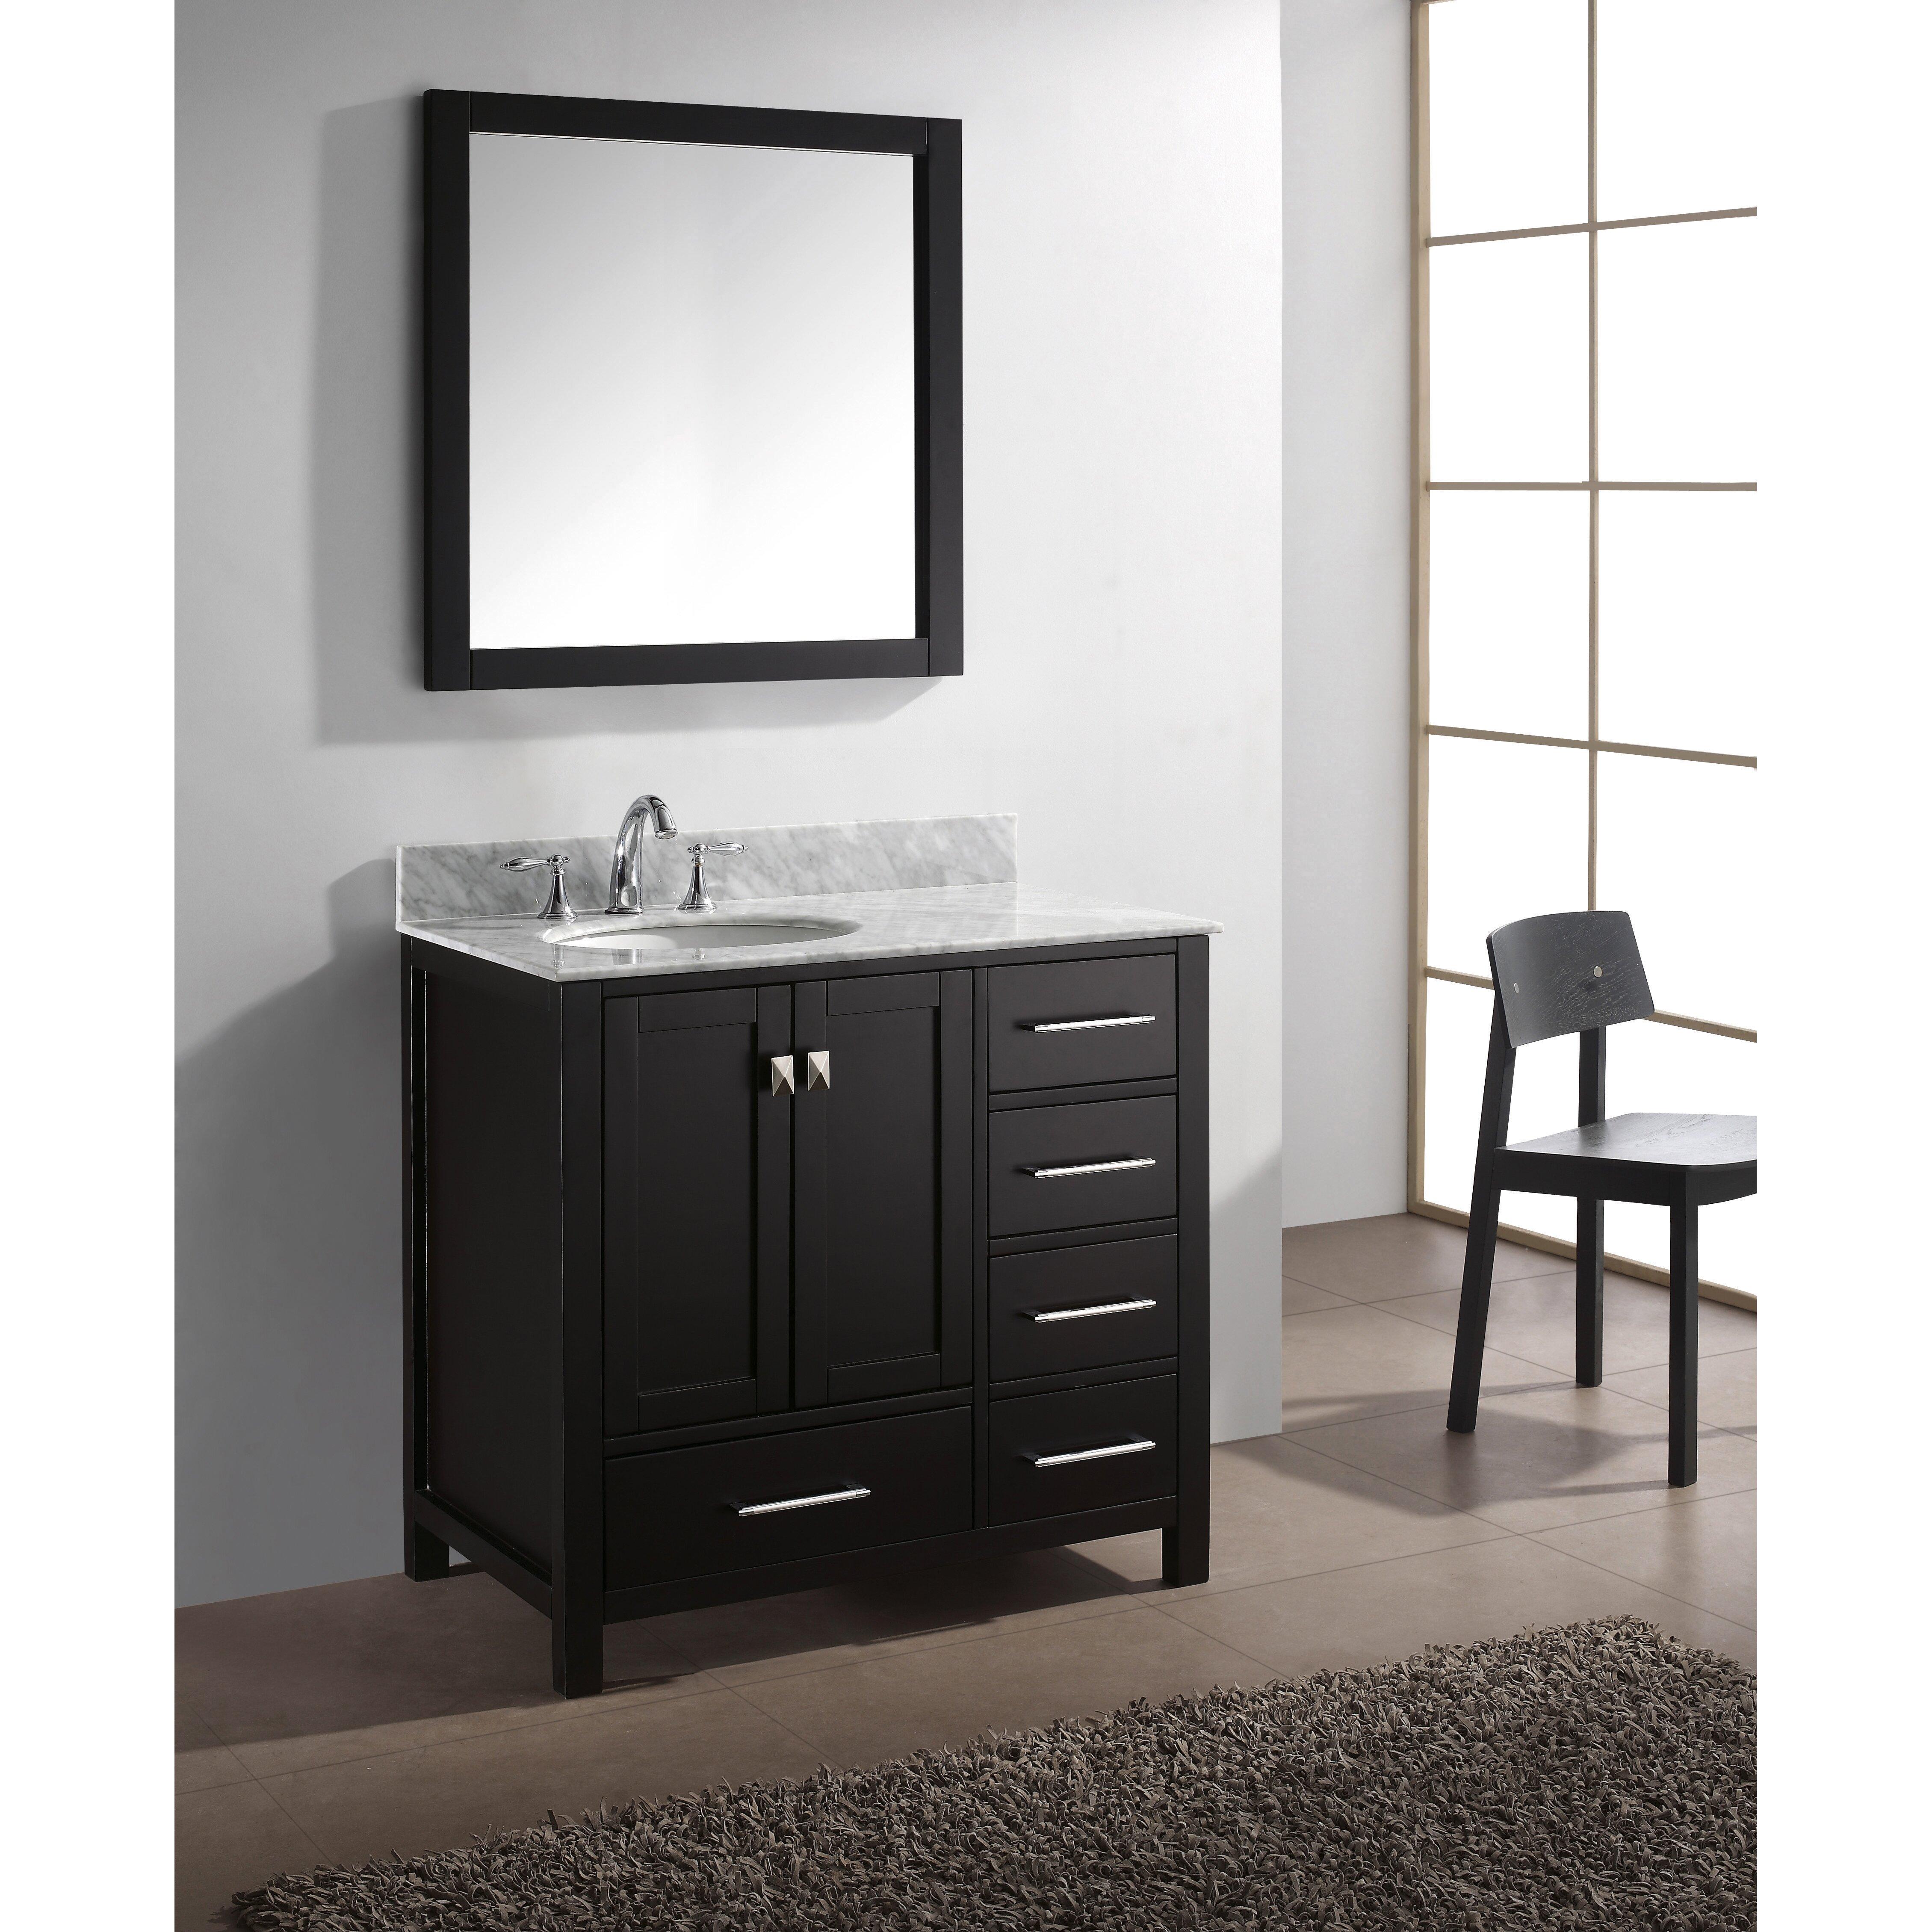 "Virtu Caroline Avenue 37"" Single Bathroom Vanity Set with Carrara White"